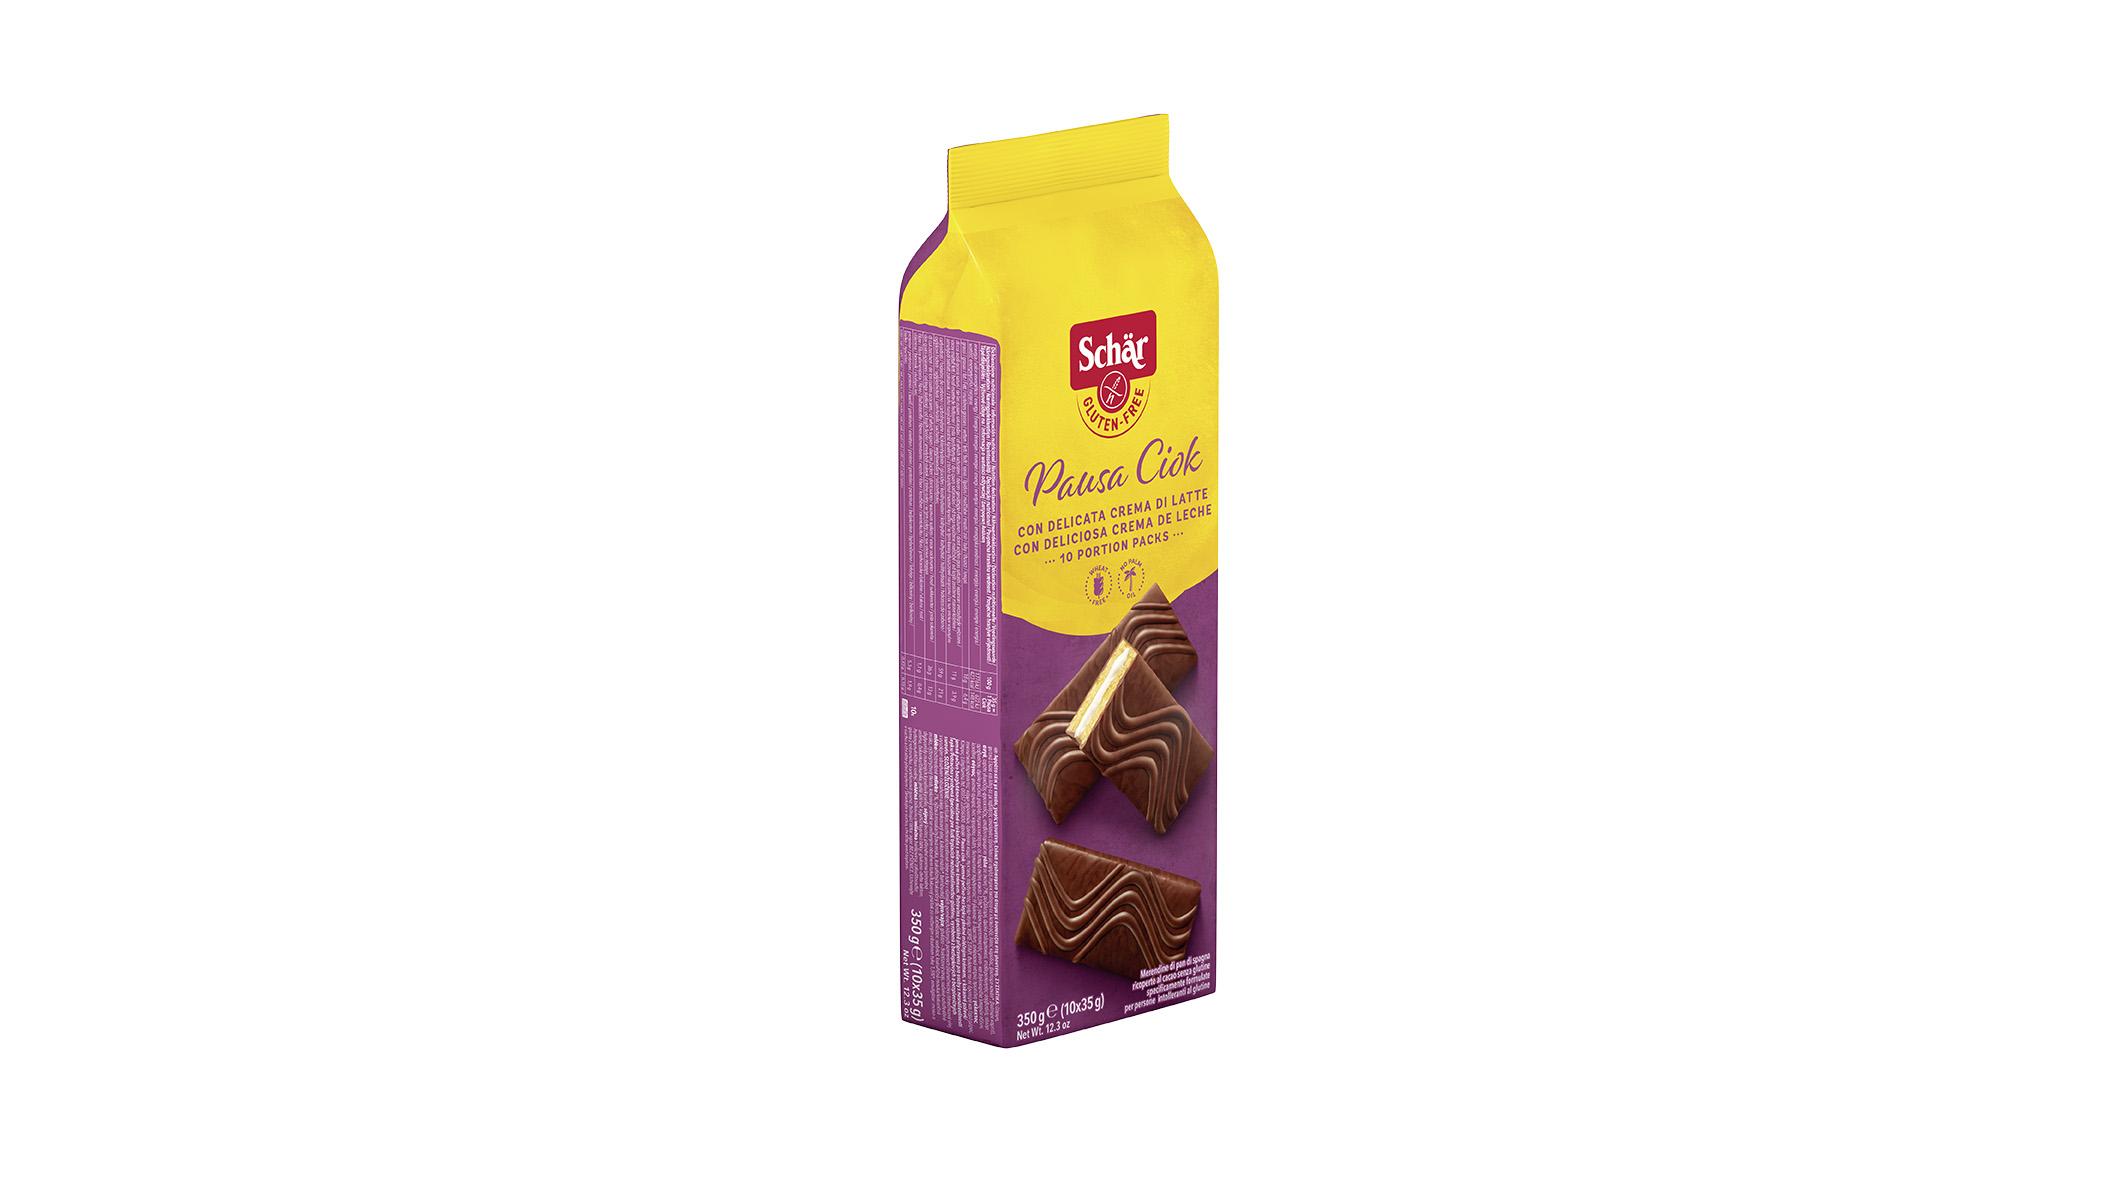 Bezglutenski čokoladni biskvit - Pausa Ciok